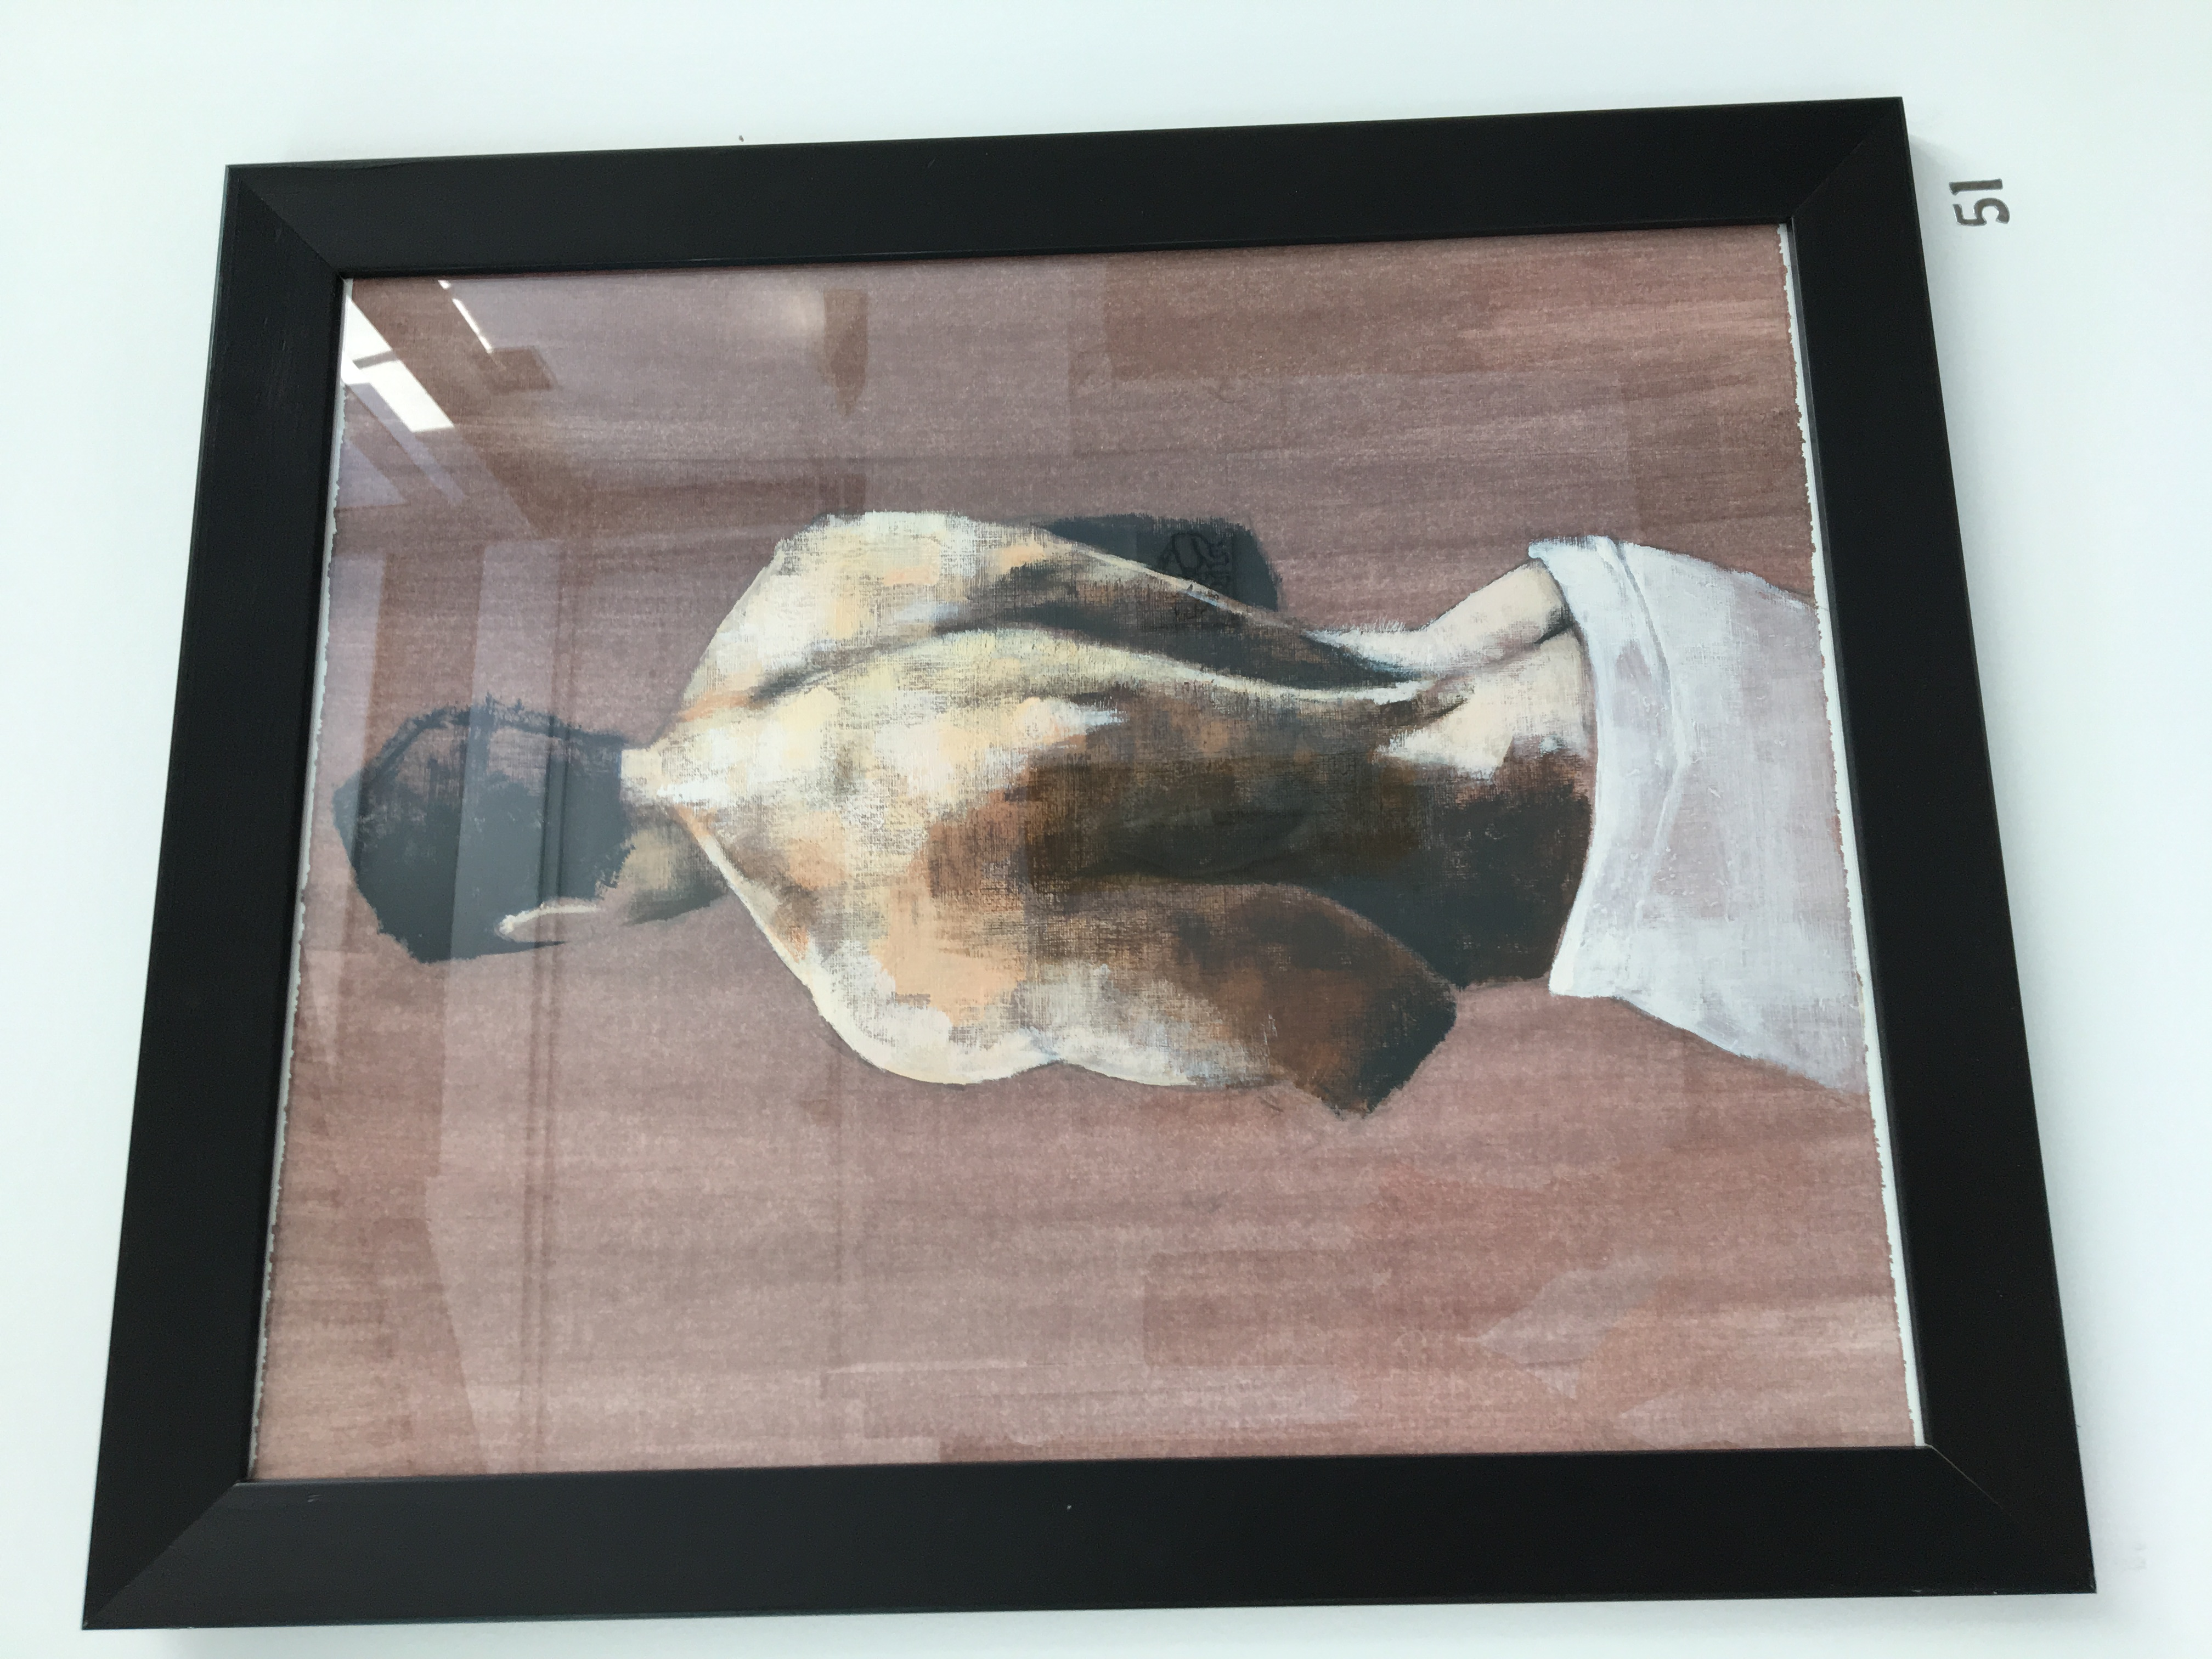 51. Untitled, James Cooper, 48 x 58 x 2, £140